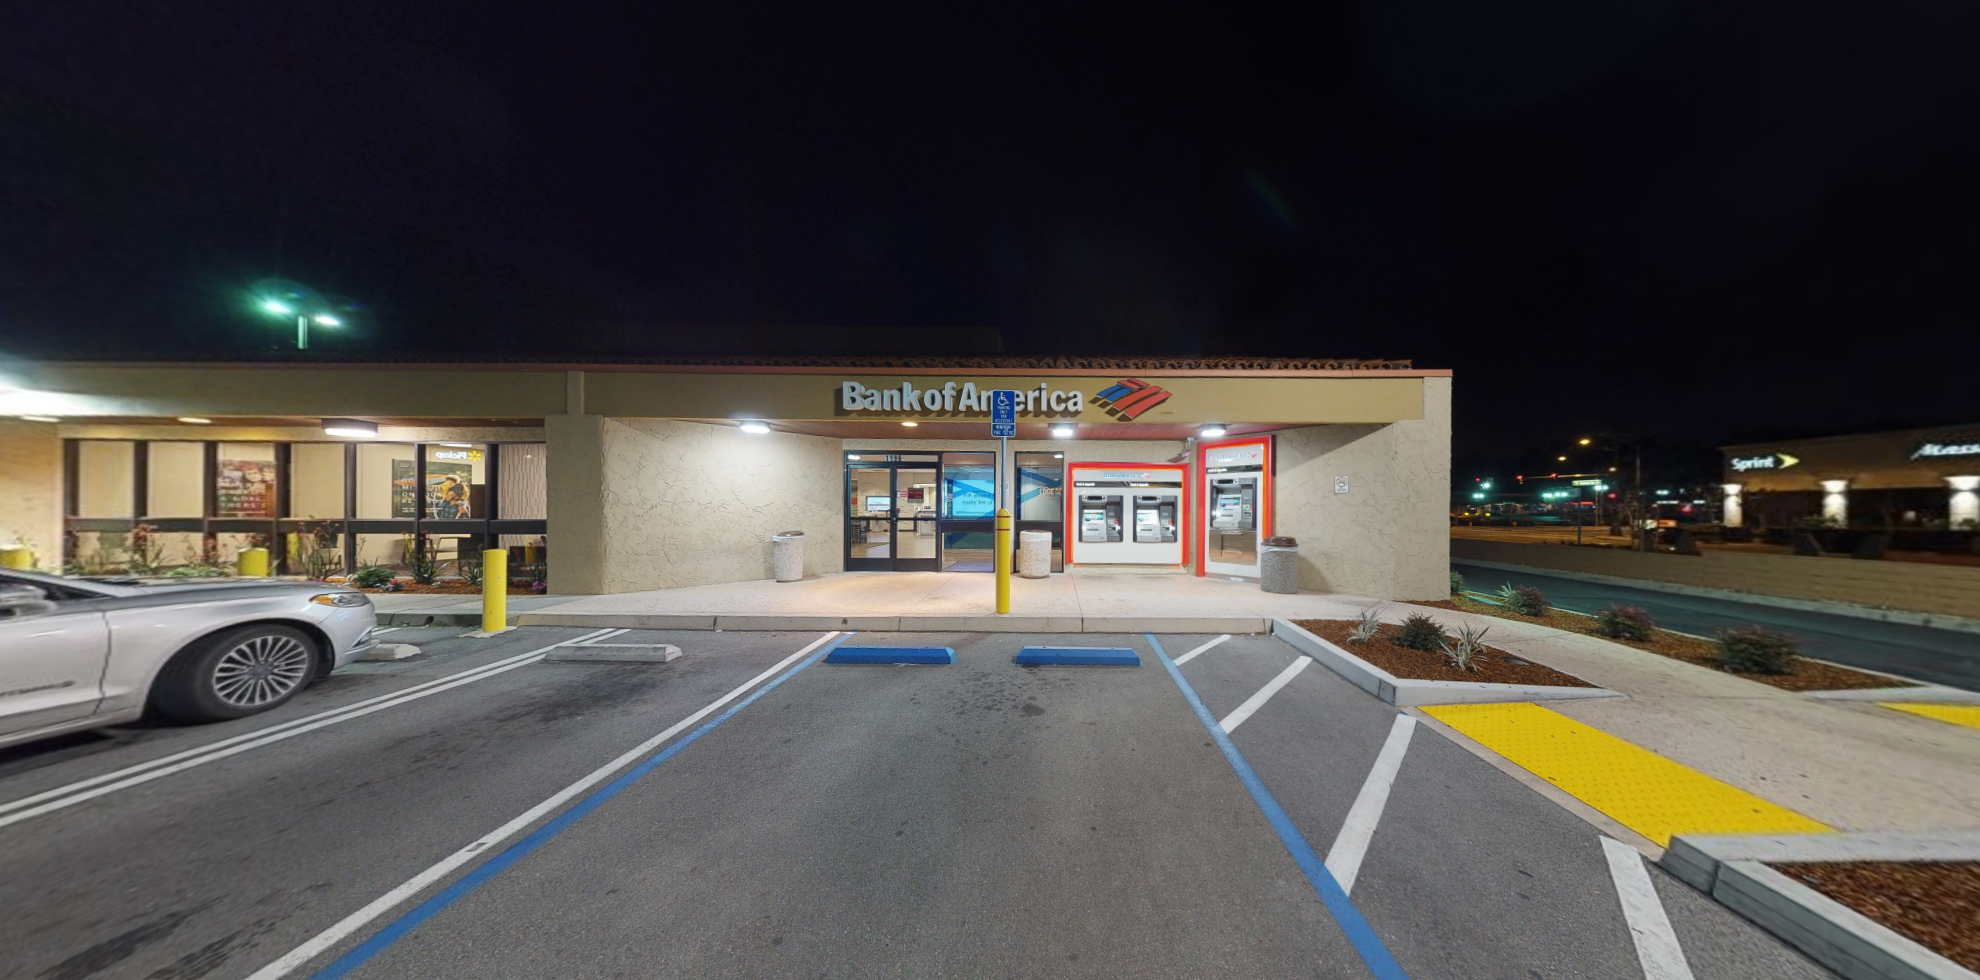 Bank of America financial center with drive-thru ATM | 1196 S Diamond Bar Blvd, Diamond Bar, CA 91765